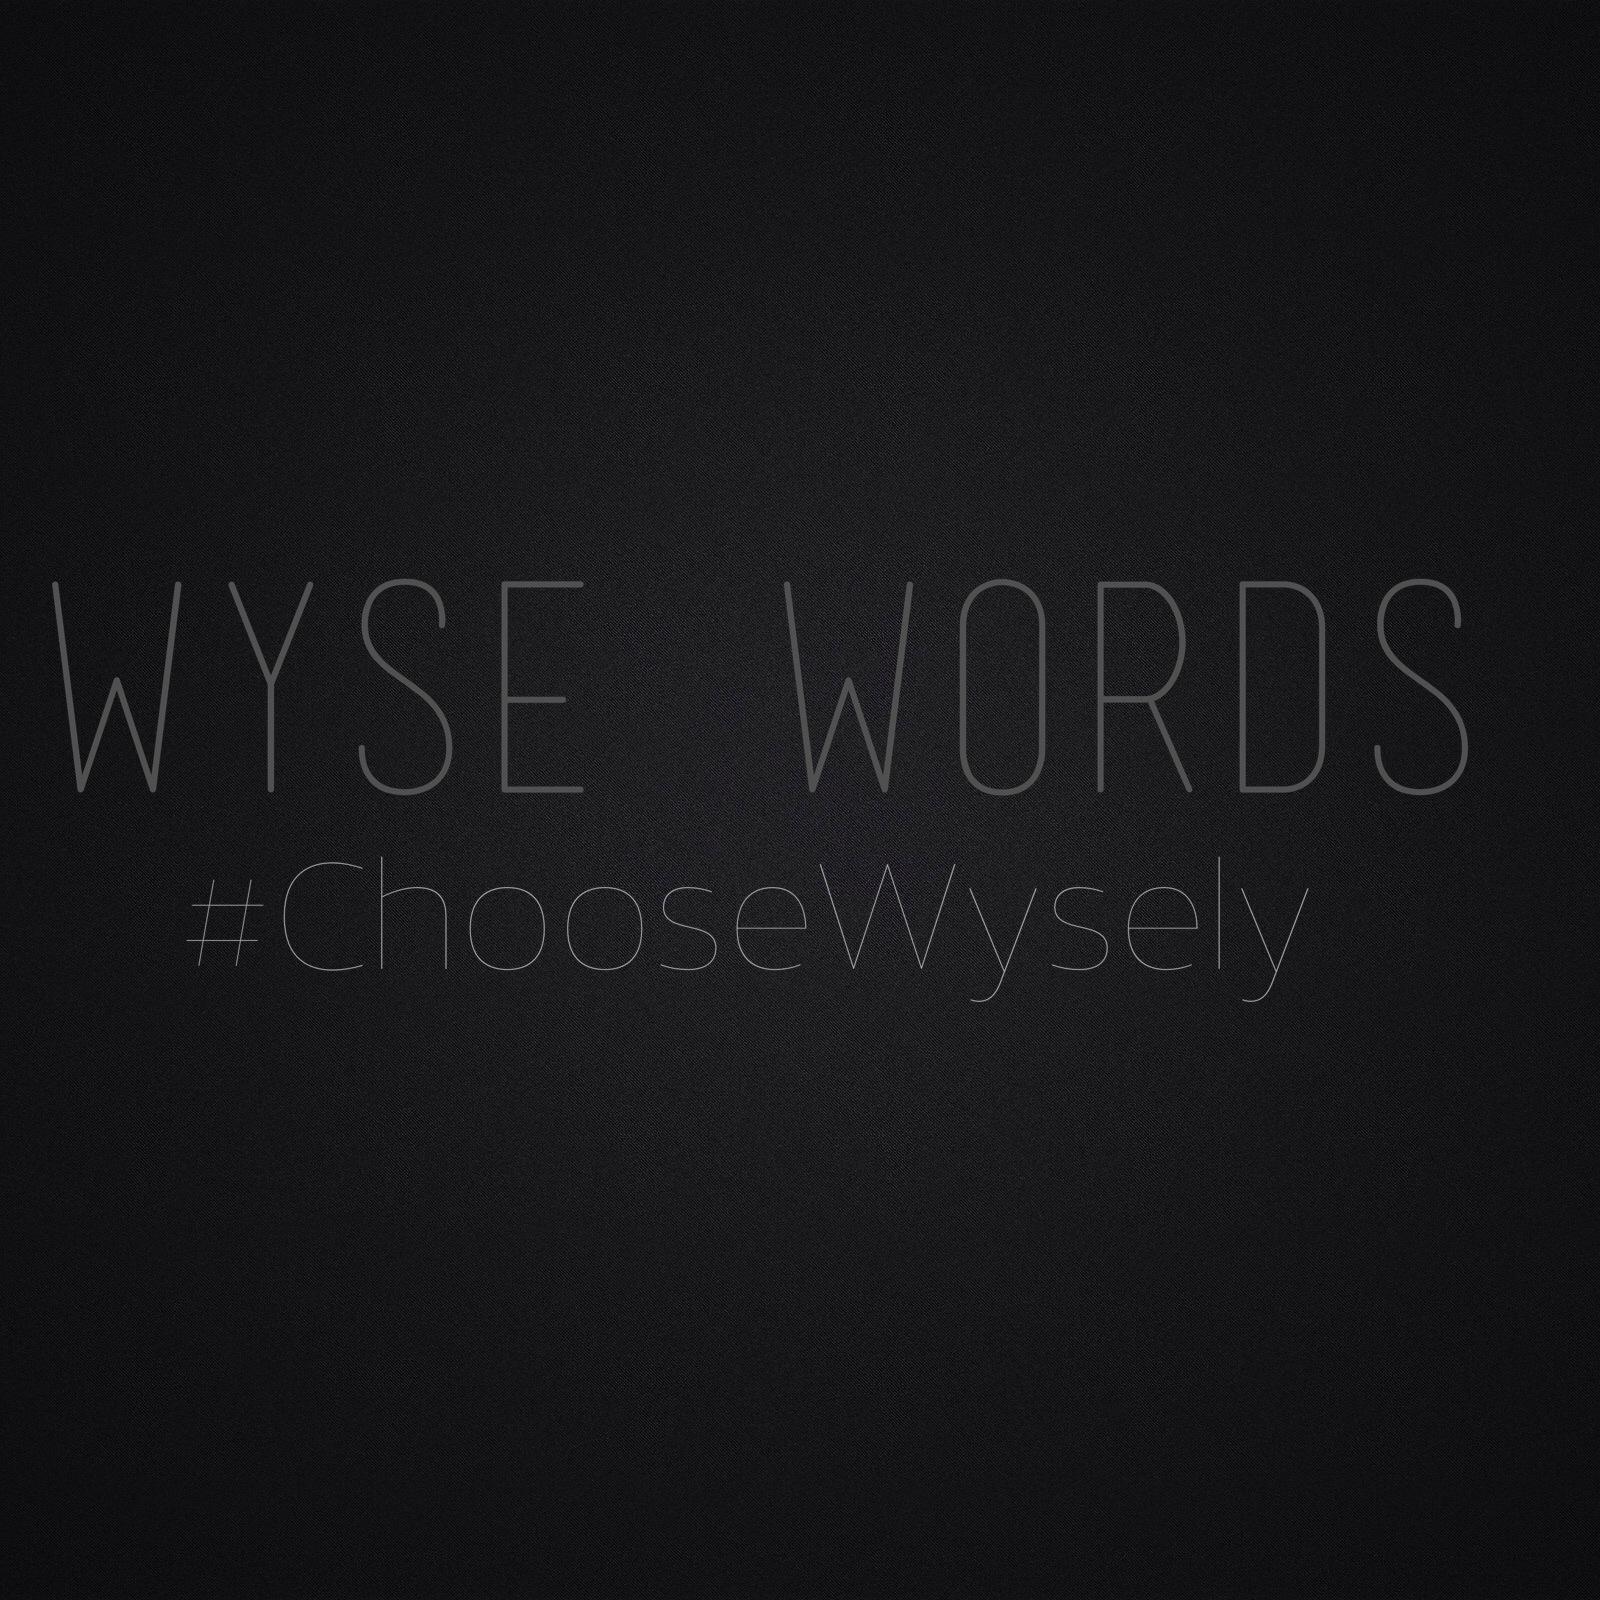 [Word To The Wyse] Jay Wyse X Wyse Words